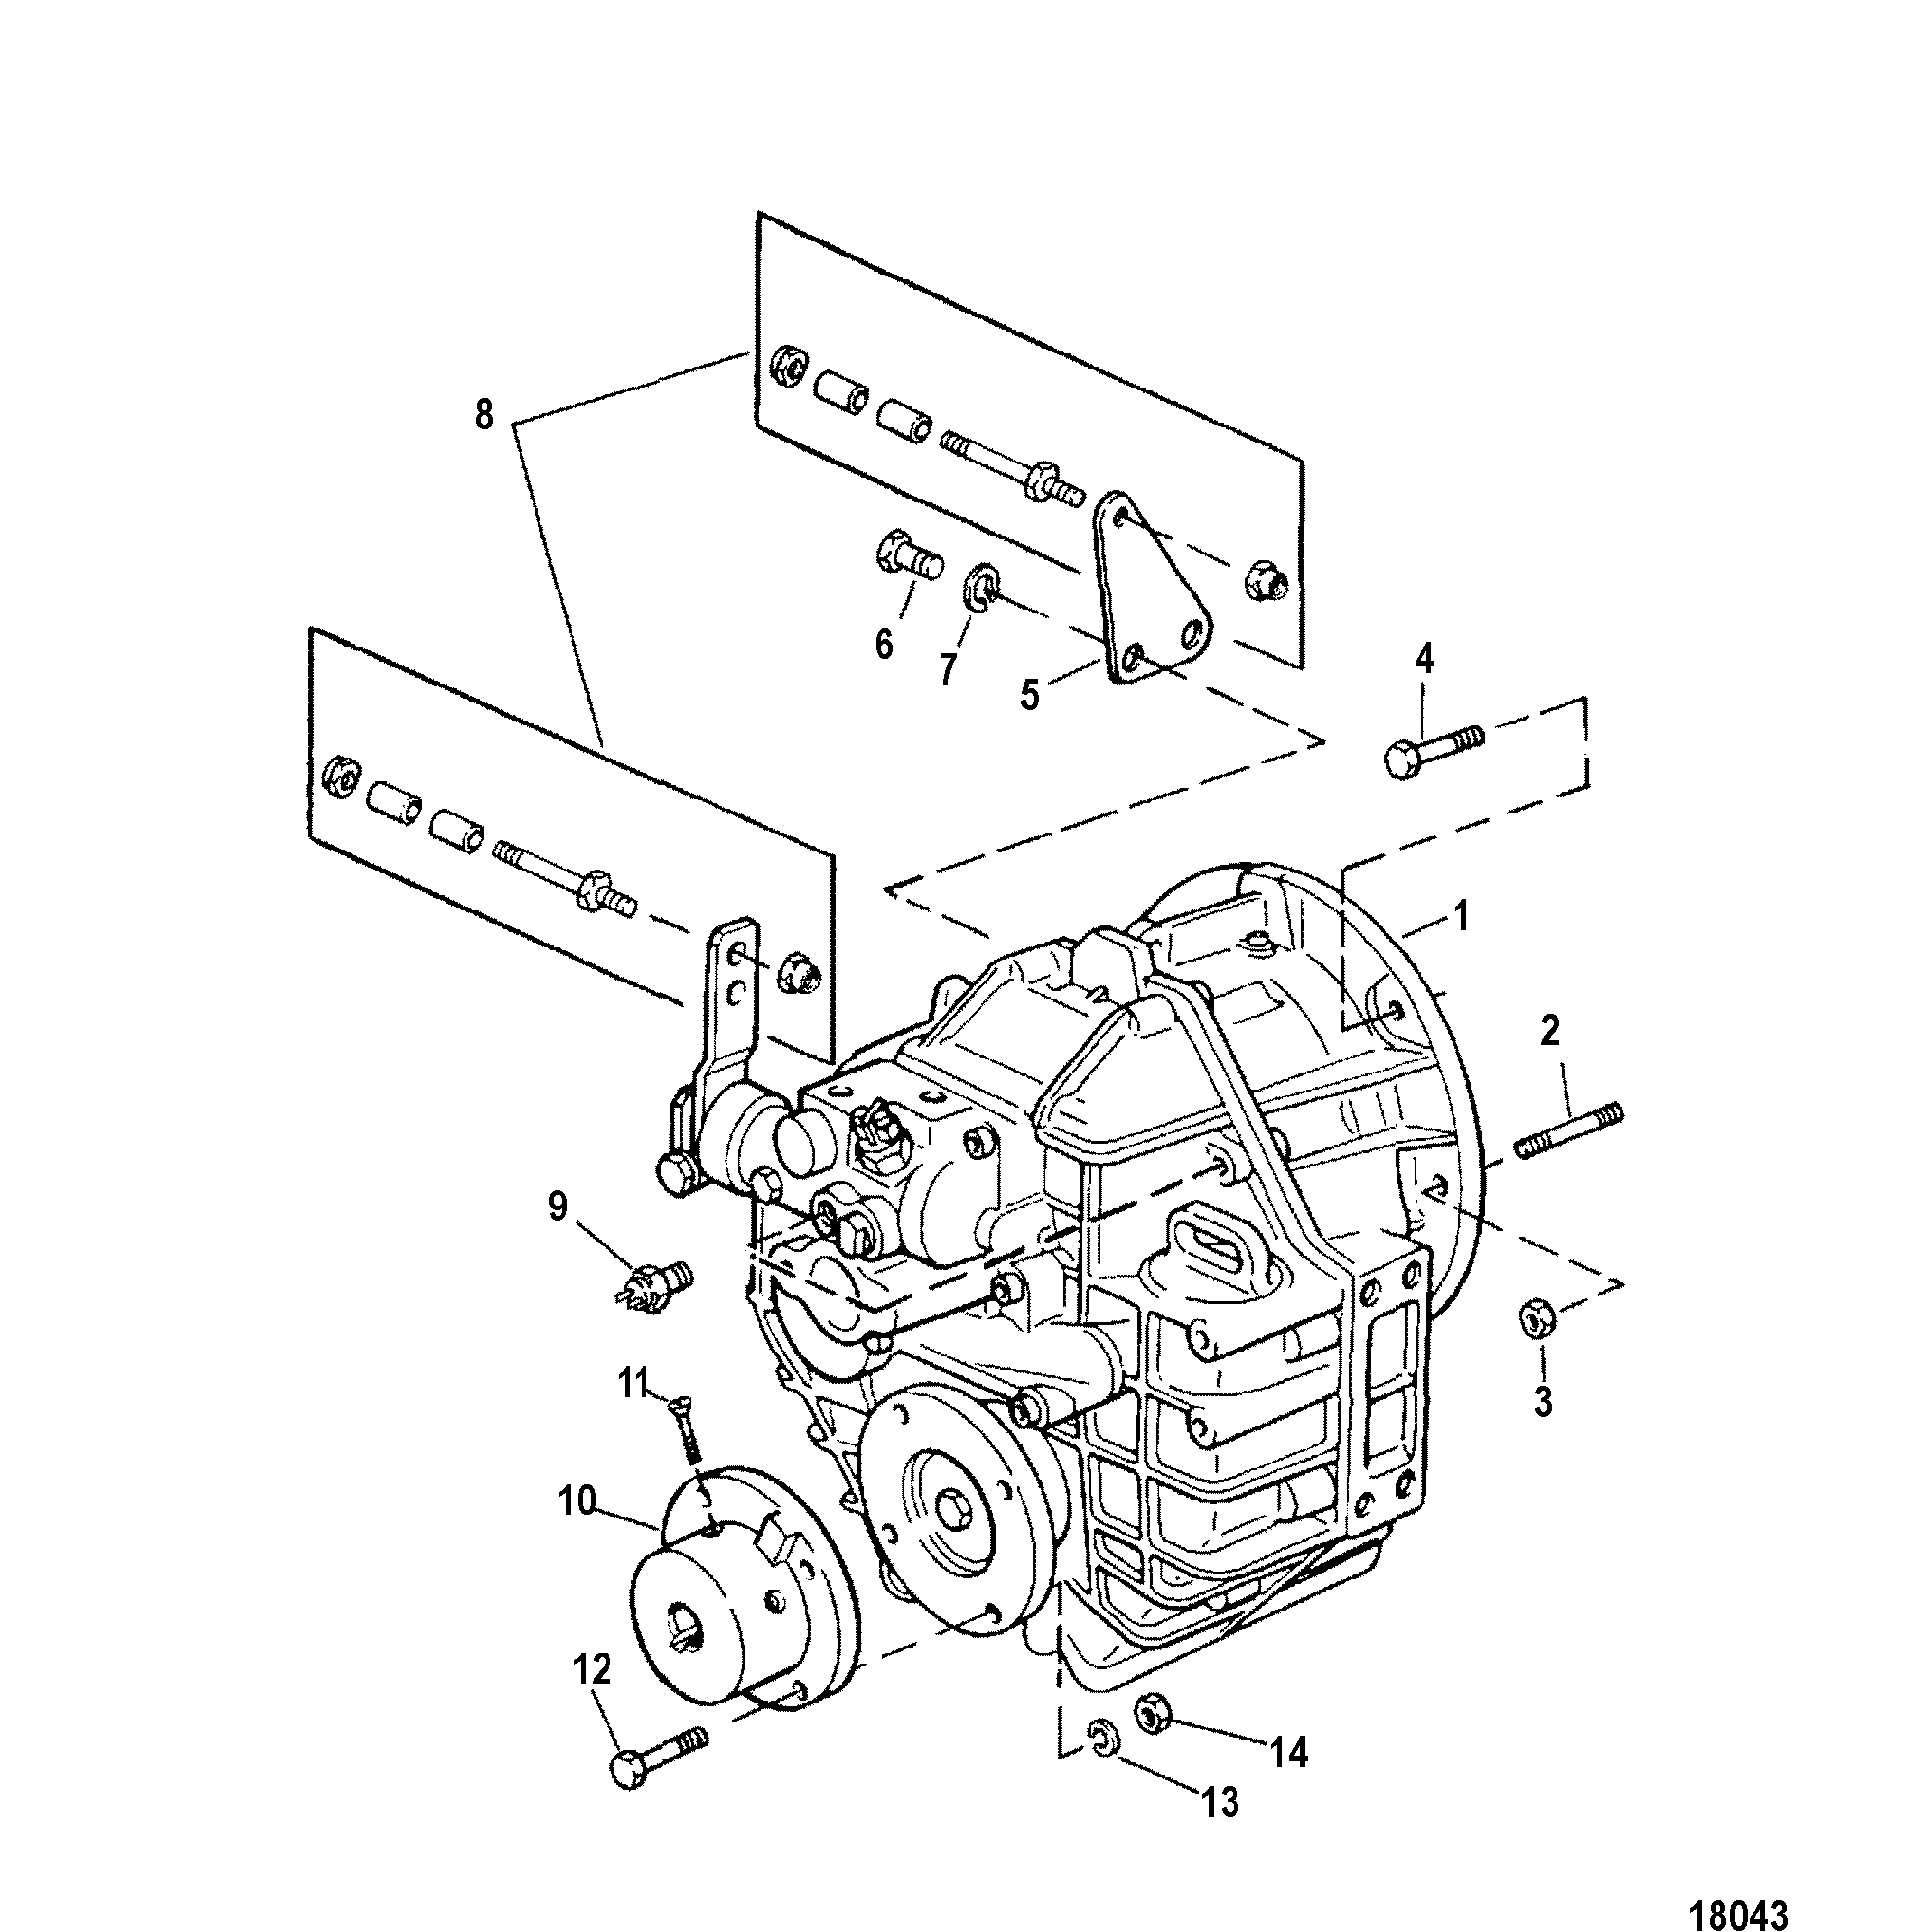 rheem water heater parts catalog